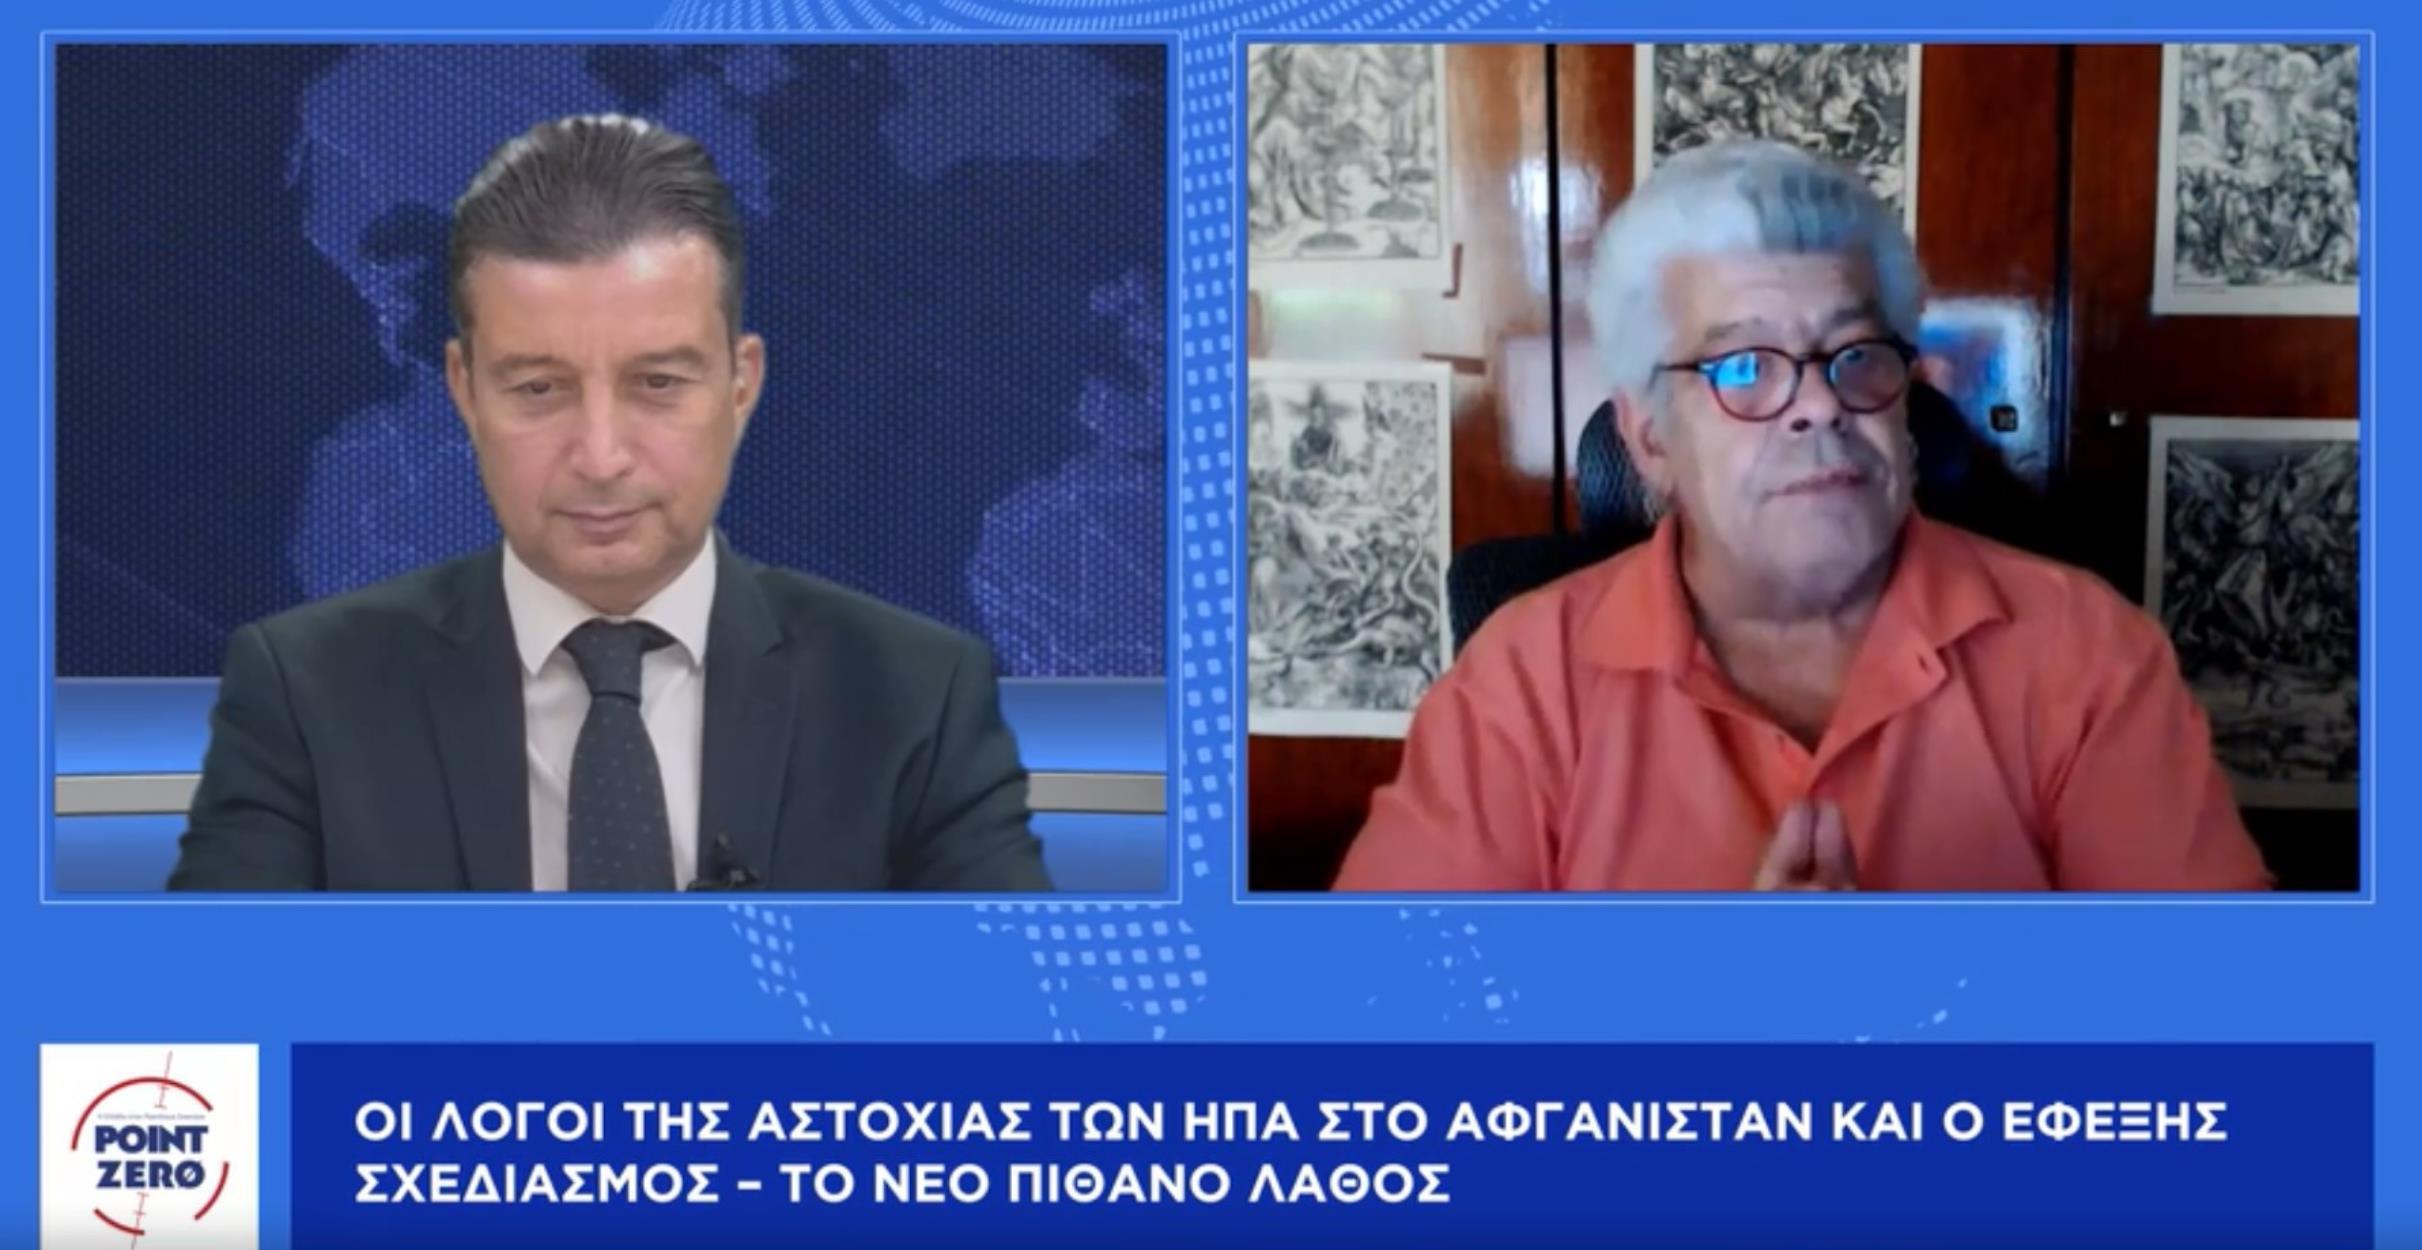 Iωάννης Μάζης στο pagenews.gr